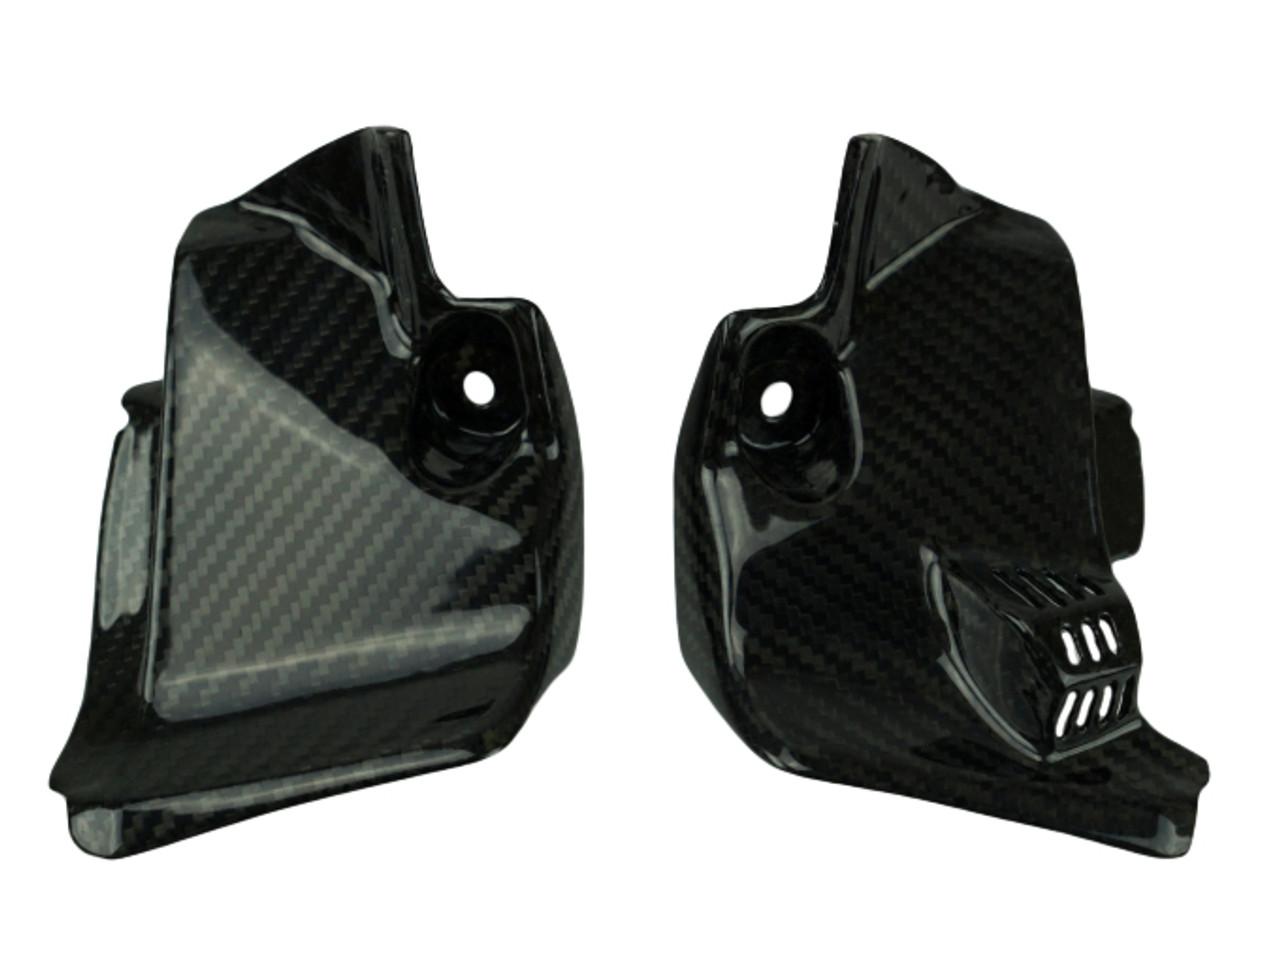 Inner Dash Panels in Glossy Twill Weave Carbon Fiber for Suzuki GSX-R1000 2017+